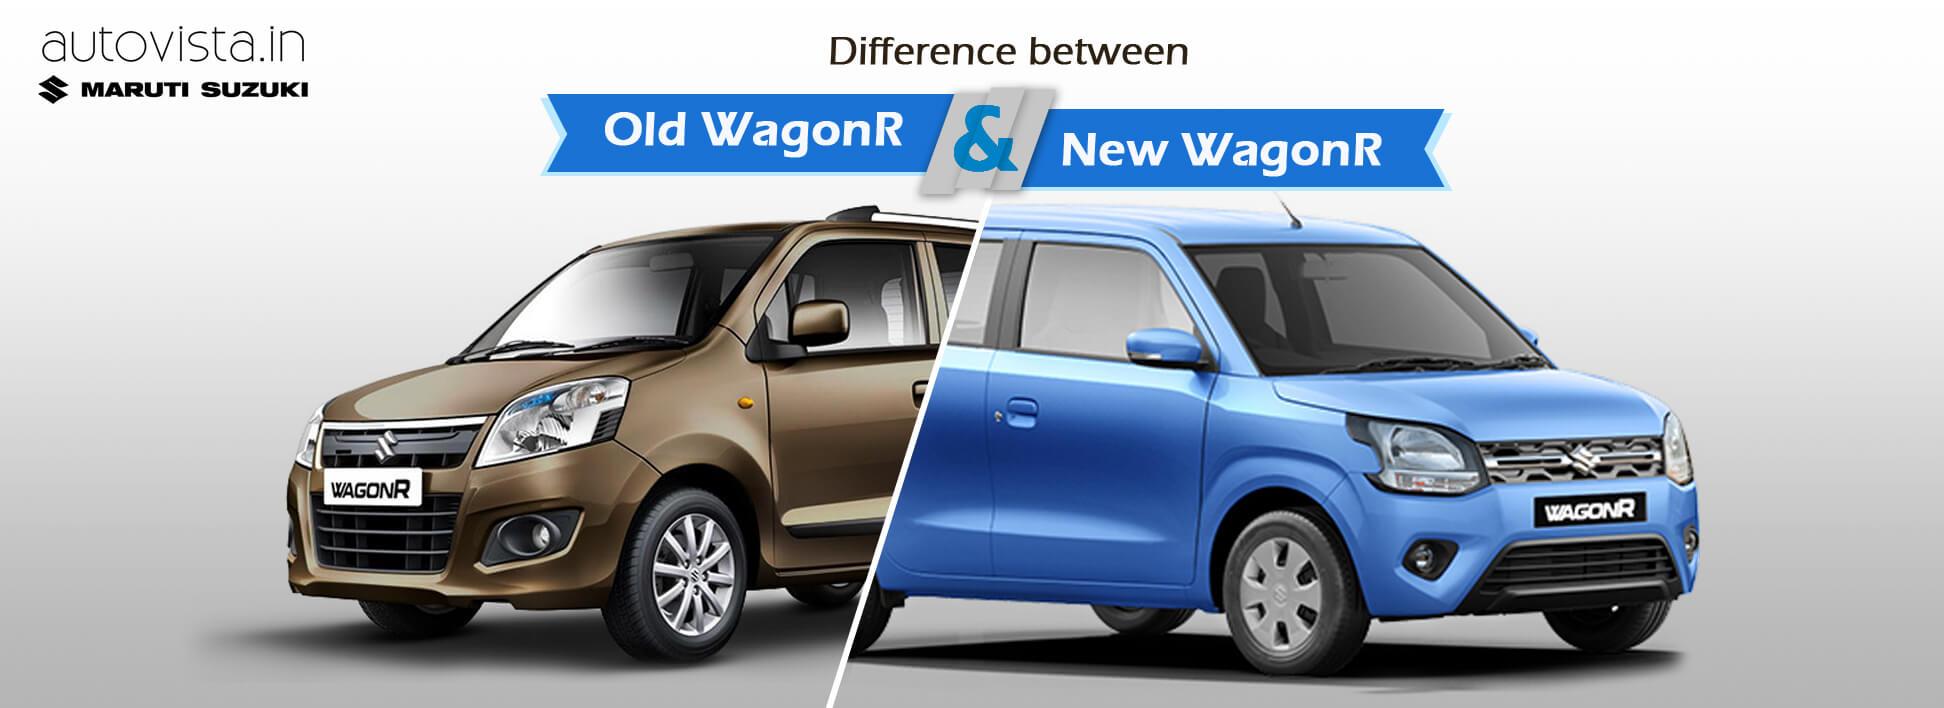 Wagon r new 2019